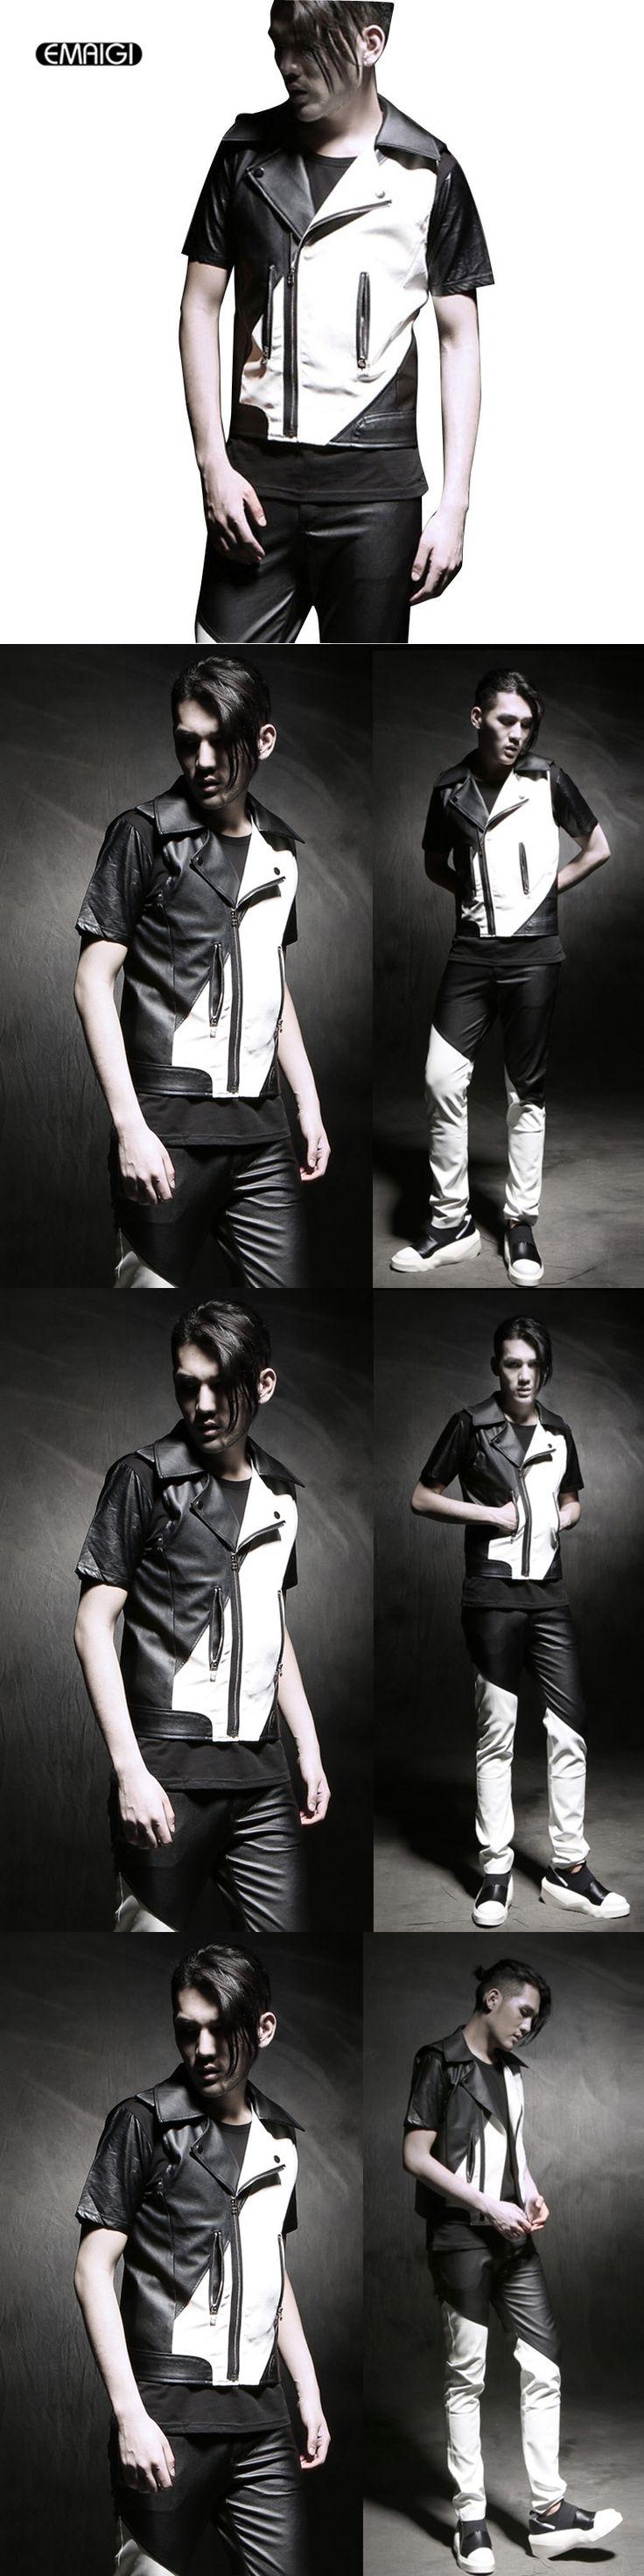 Men Leather Vest Fashion Slim Fit Sleeveless Jacket Waistcoat Black White Splice Punk Motorcycle Vest Male Stage Costume A425